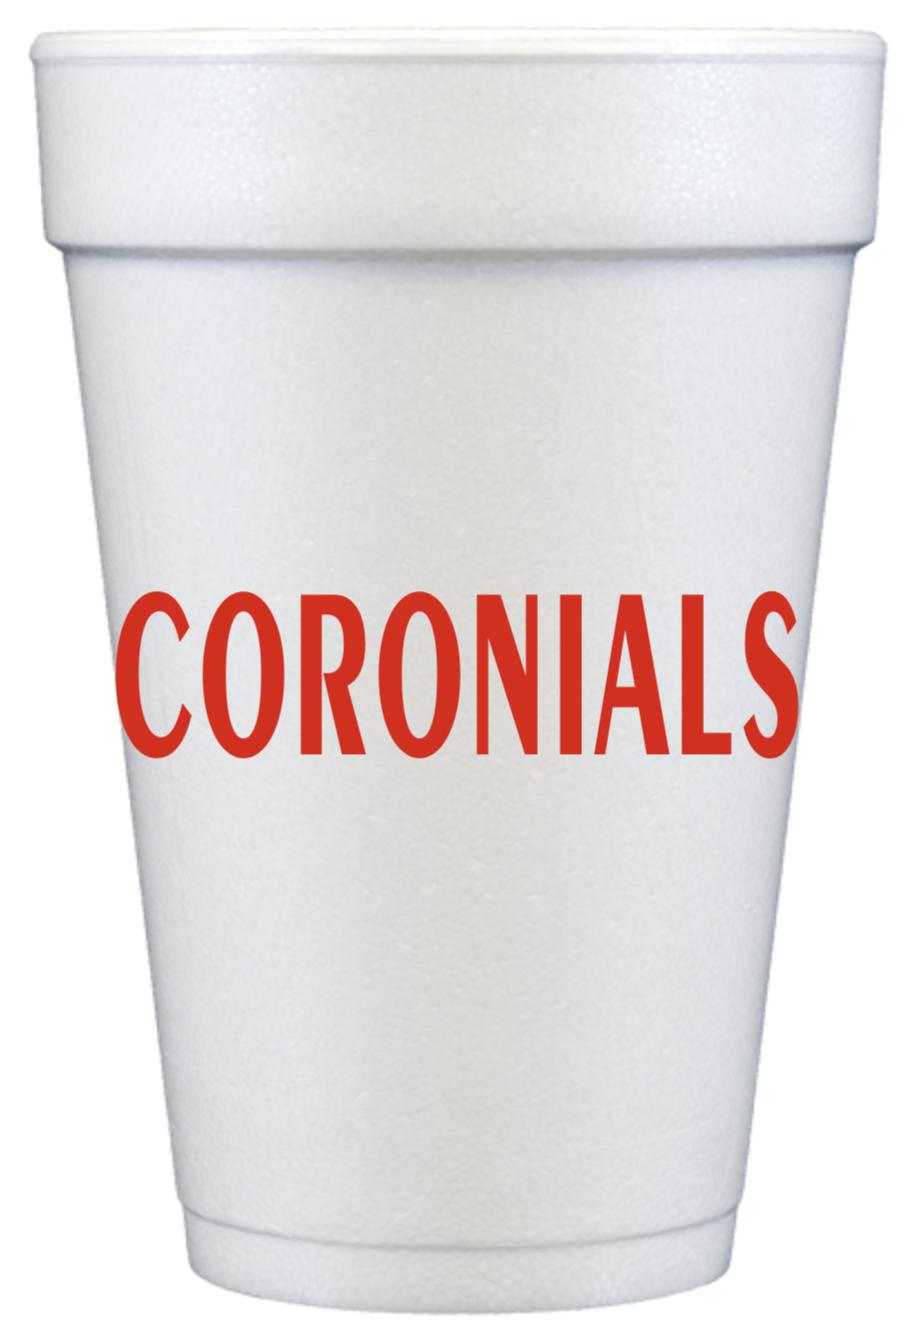 COA201 coronials